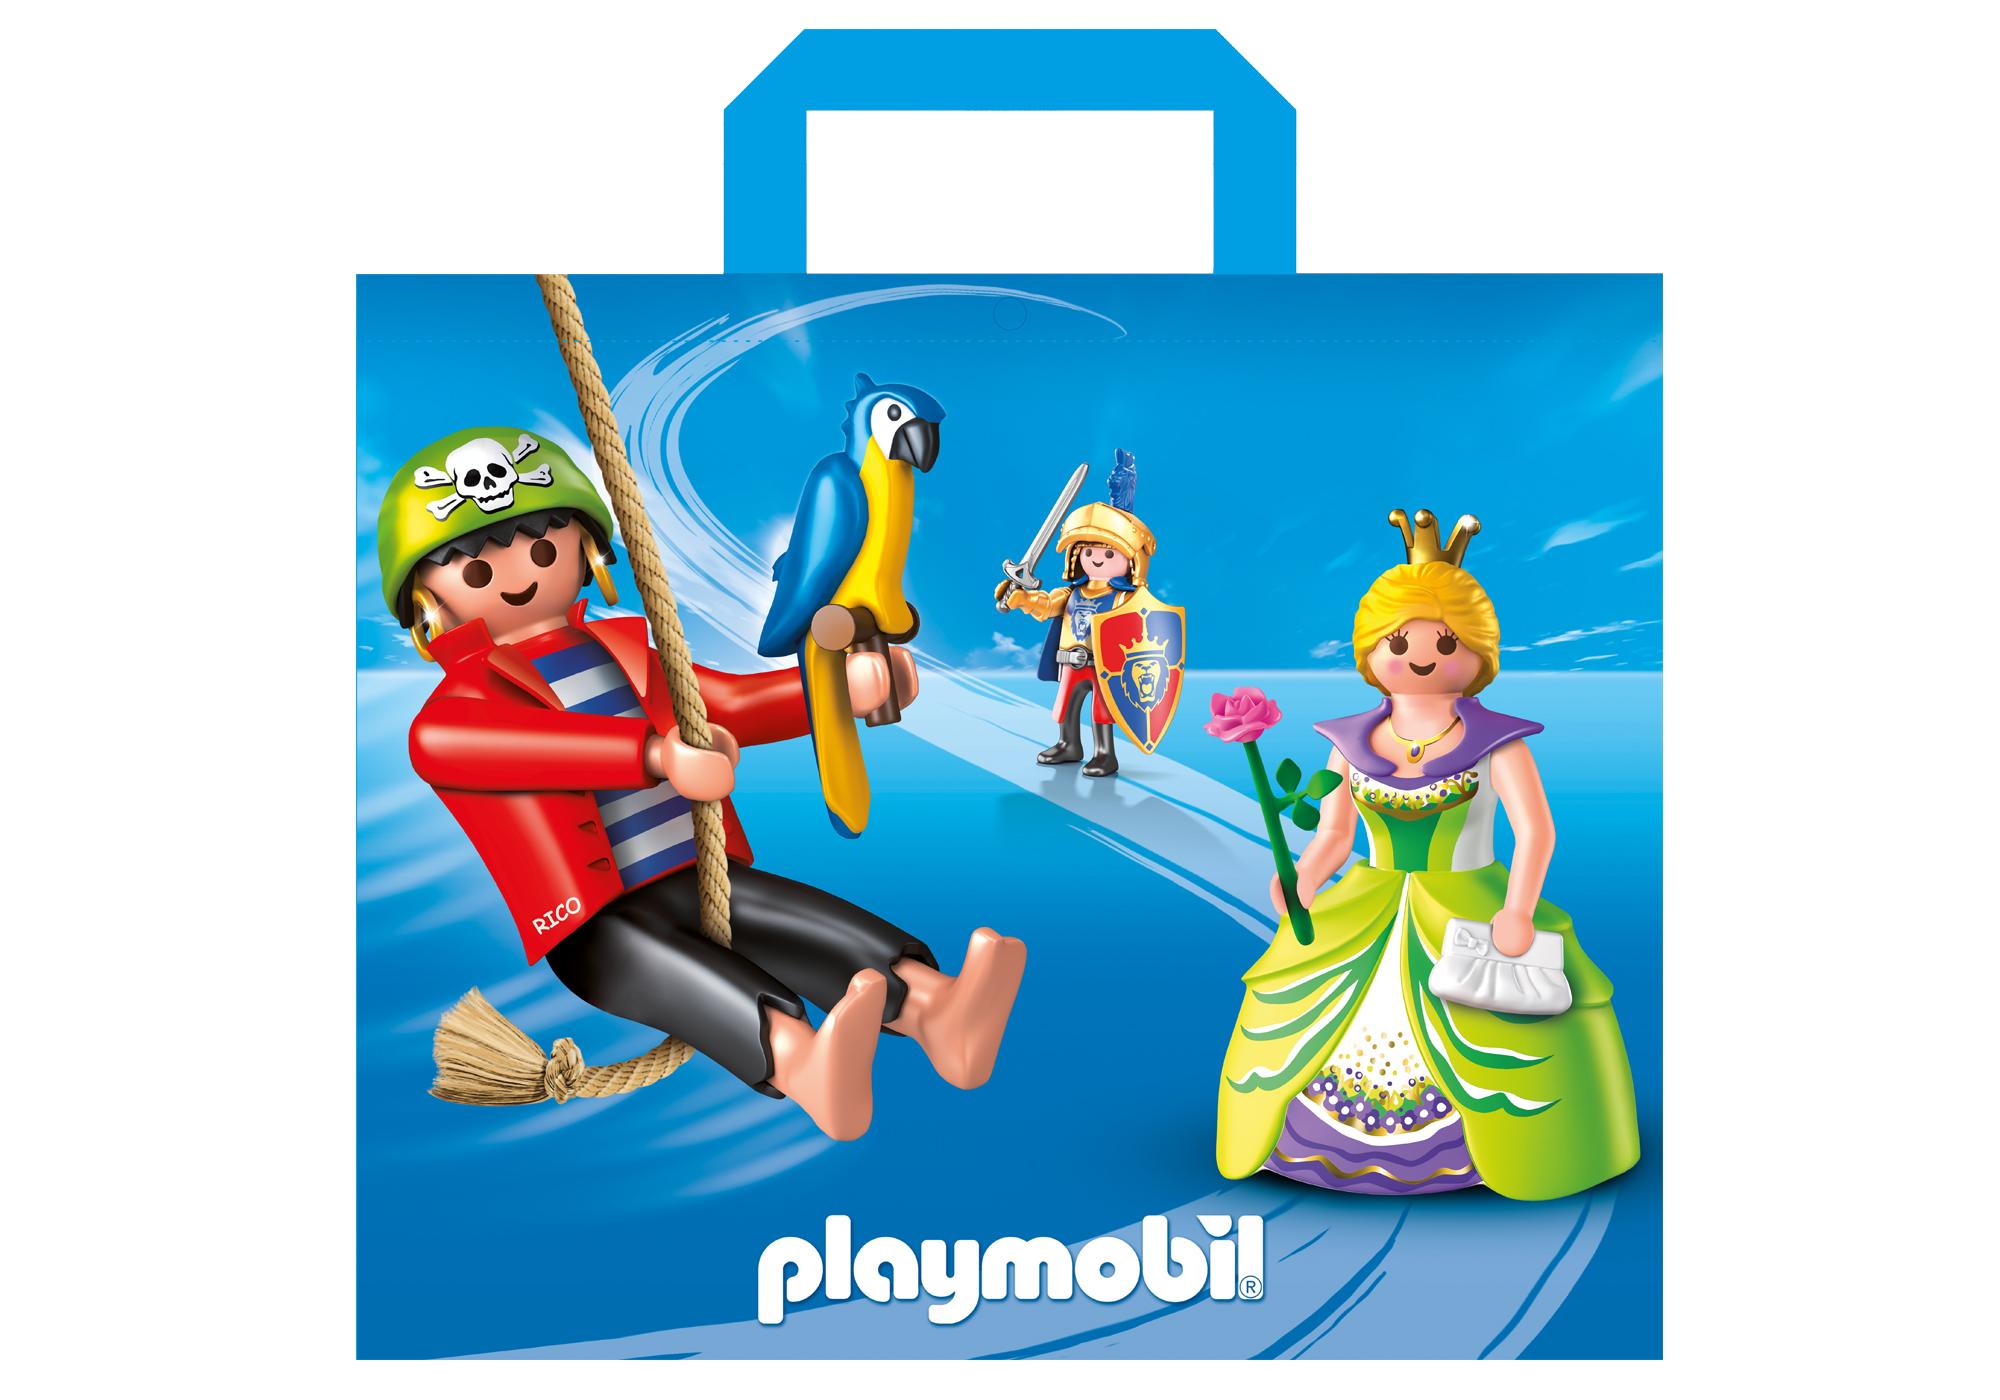 http://media.playmobil.com/i/playmobil/86483_product_detail/Einkaufstasche